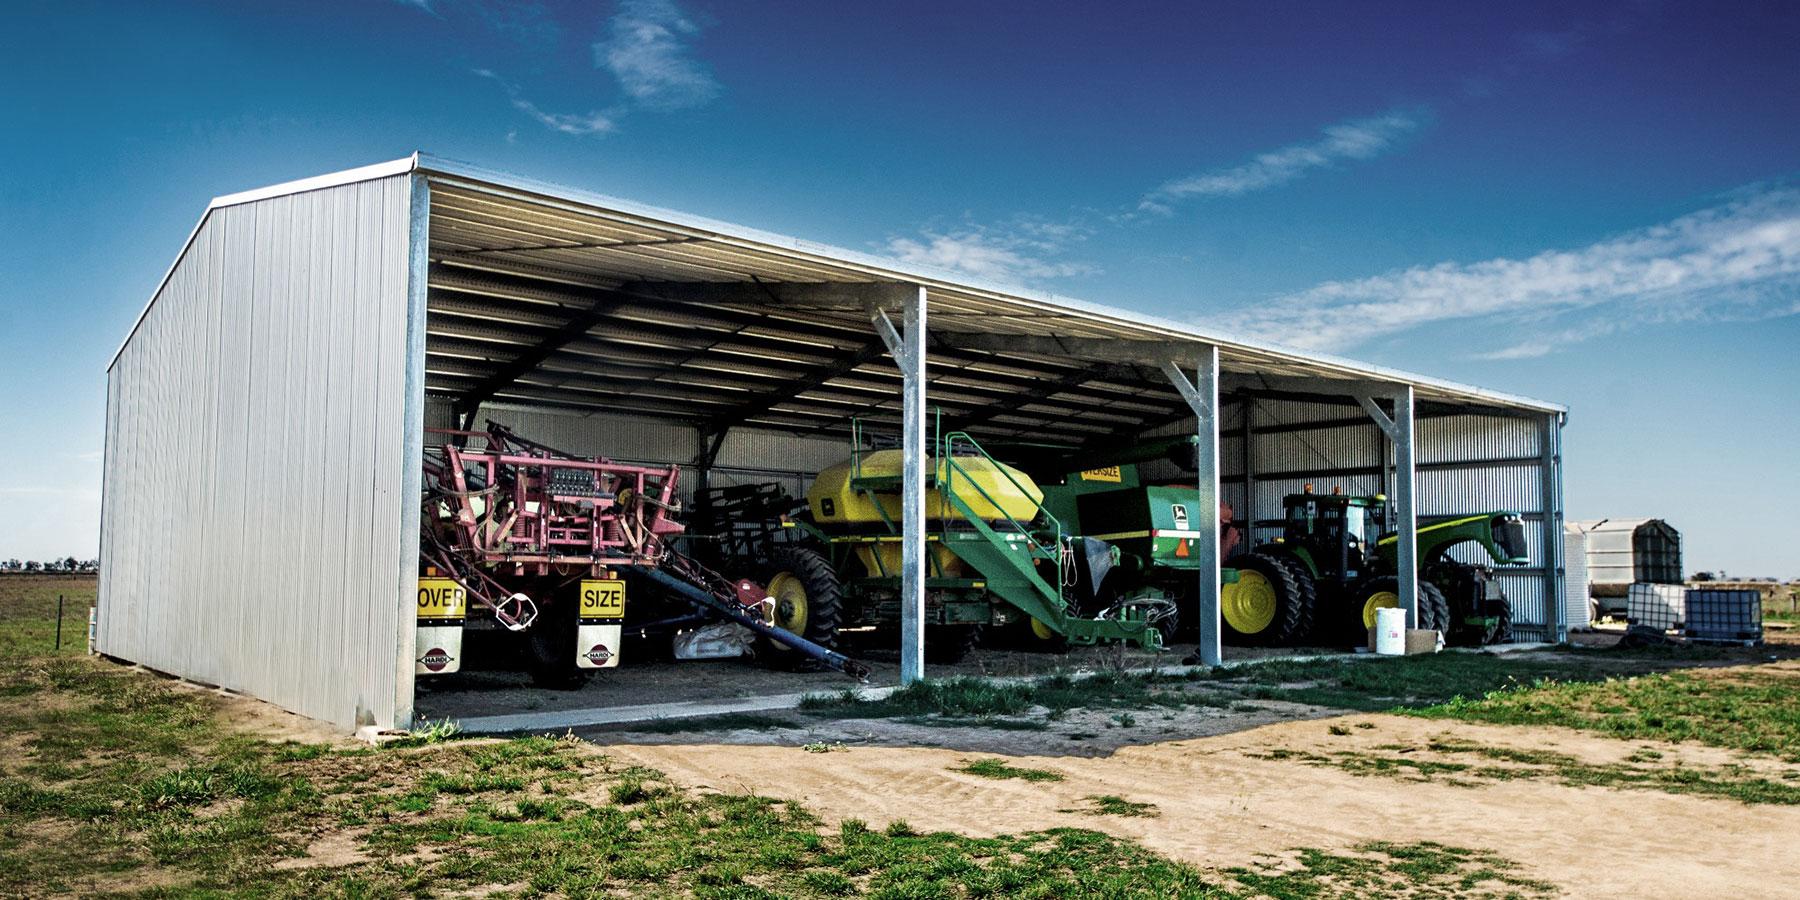 Aussie_Farmer_Sheds